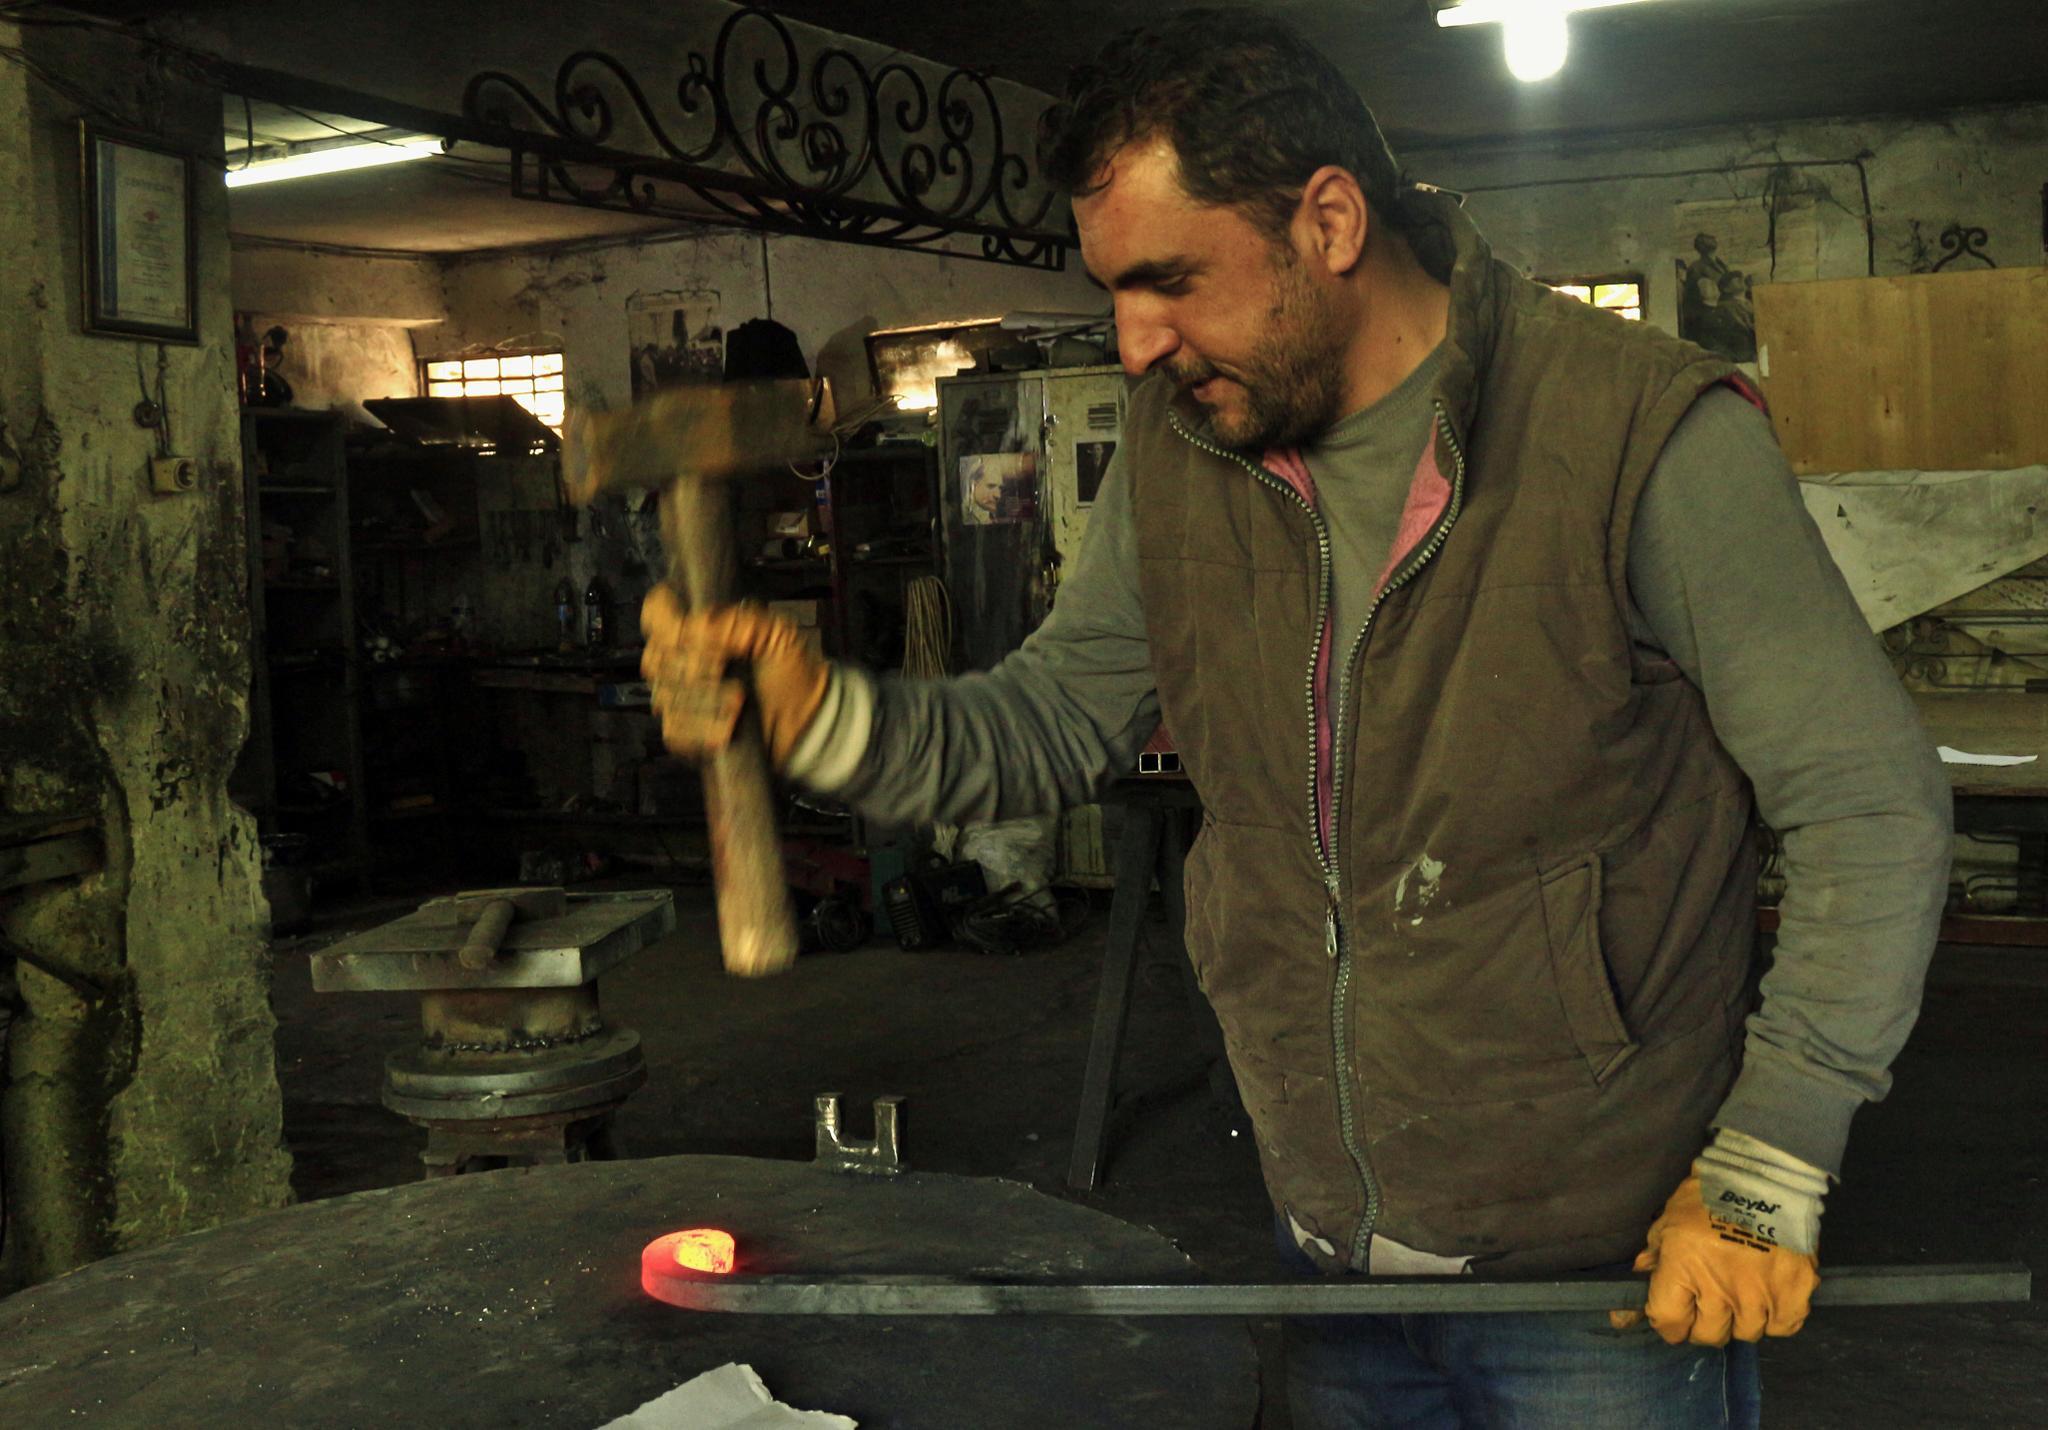 Demirci/Iron master by meryem.g.ozkaya